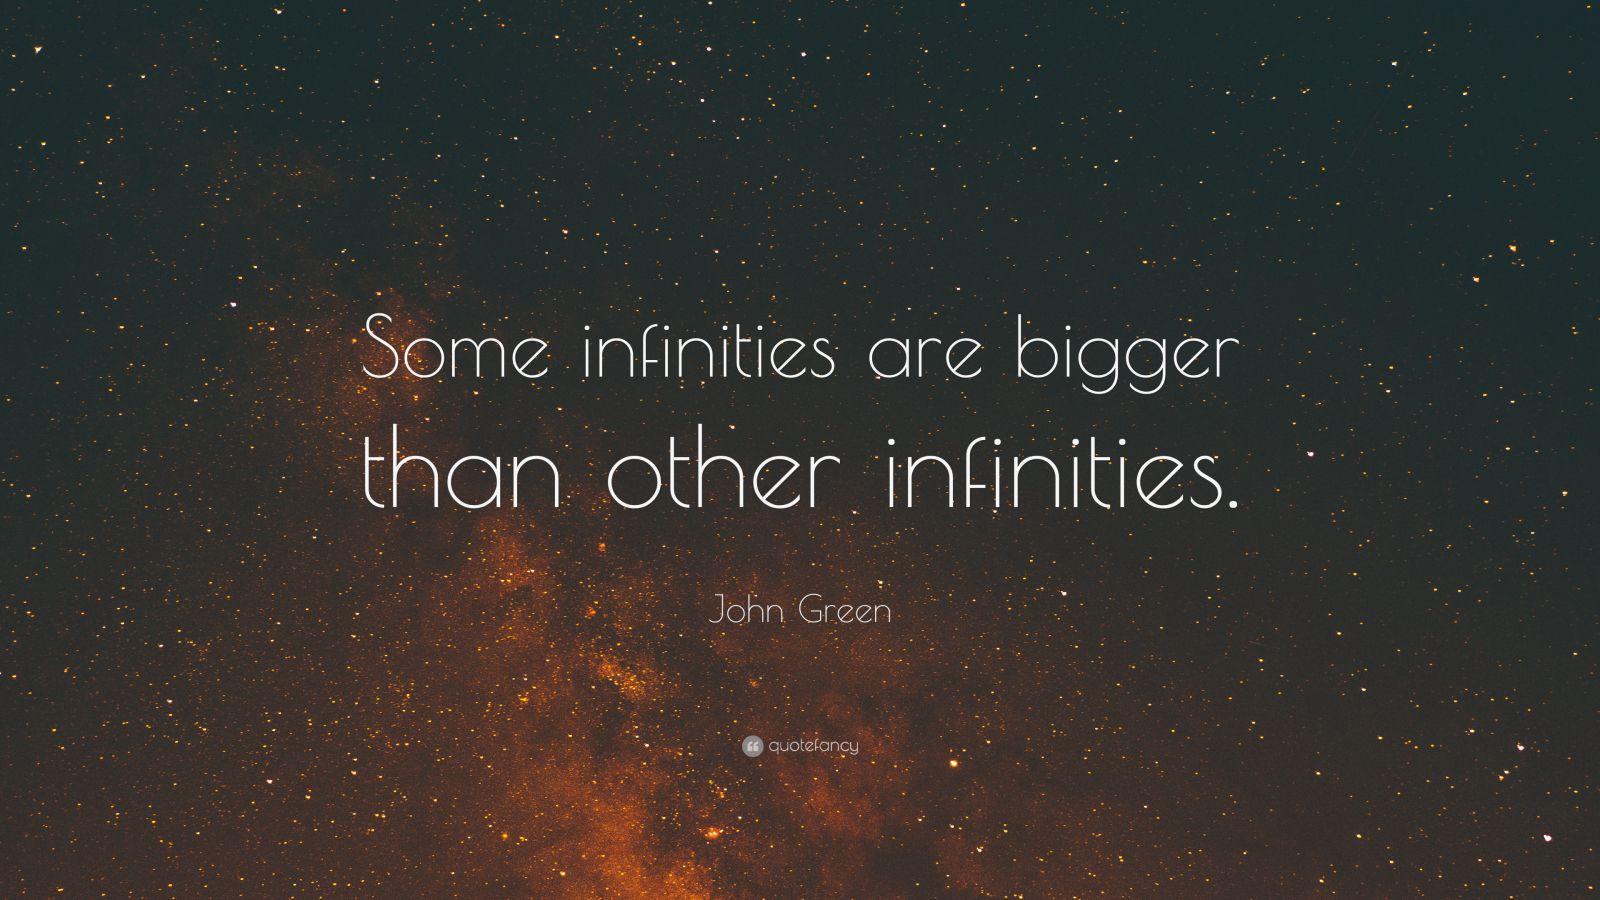 John Green Quotes John Green Quotes (100 wallpapers)   Quotefancy John Green Quotes